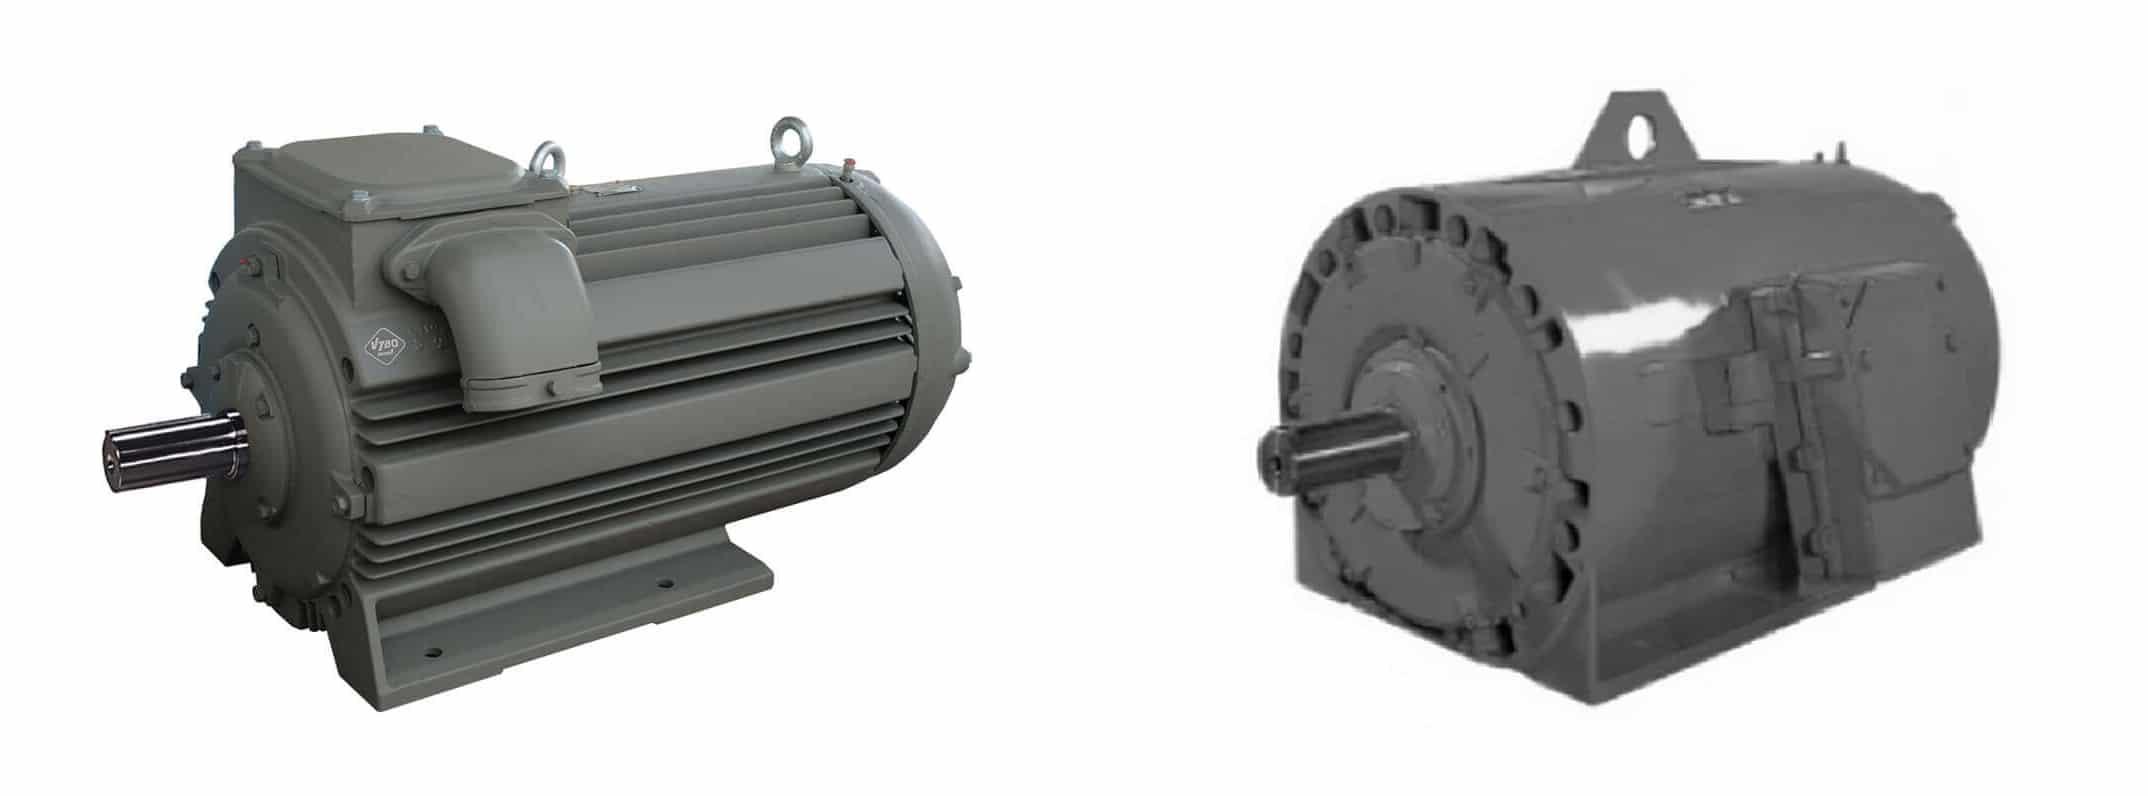 krúžkový motor a motor s kotvou nakrátko